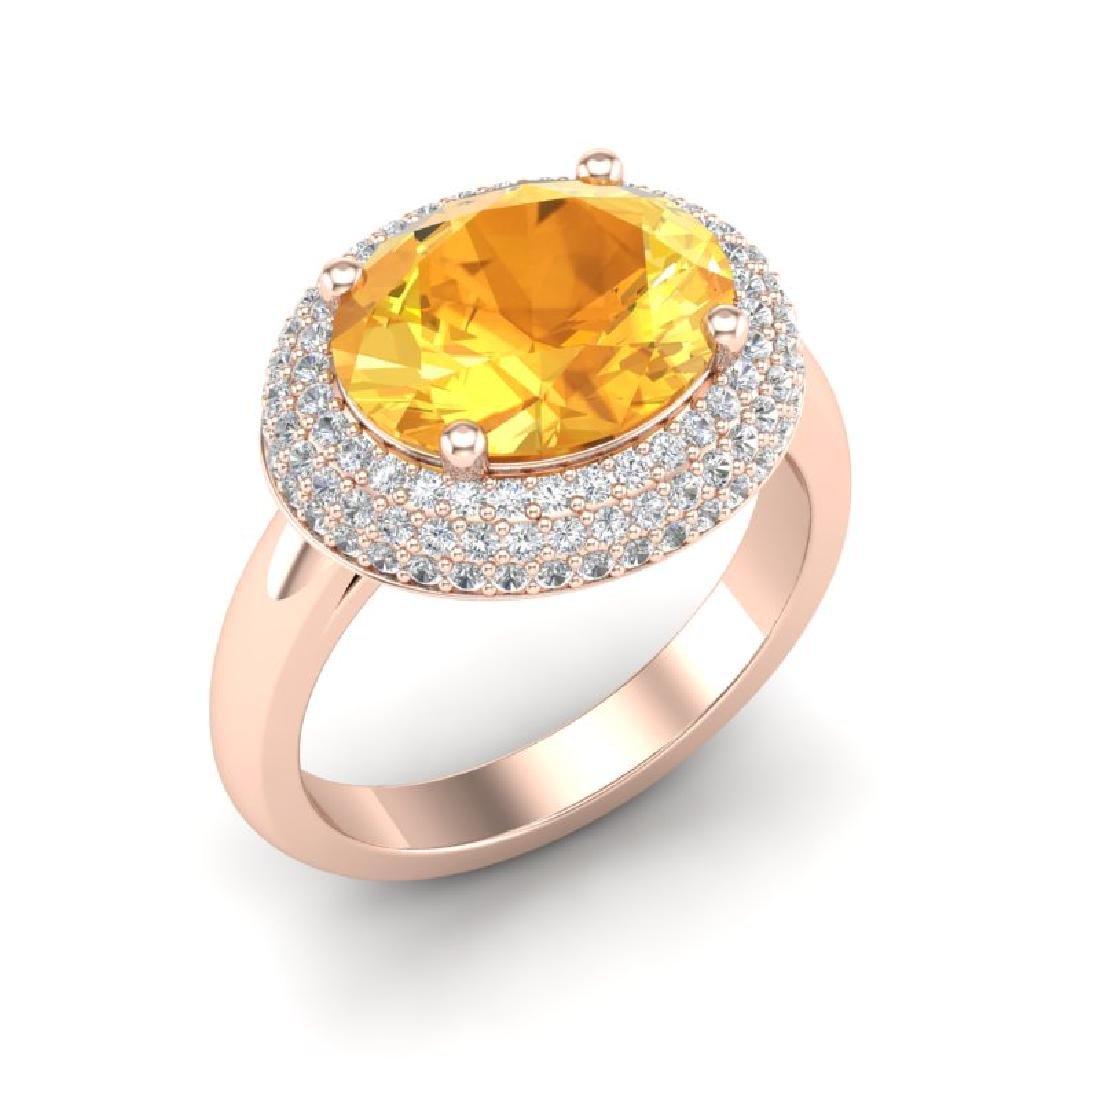 4 CTW Citrine & Micro Pave VS/SI Diamond Ring 14K Rose